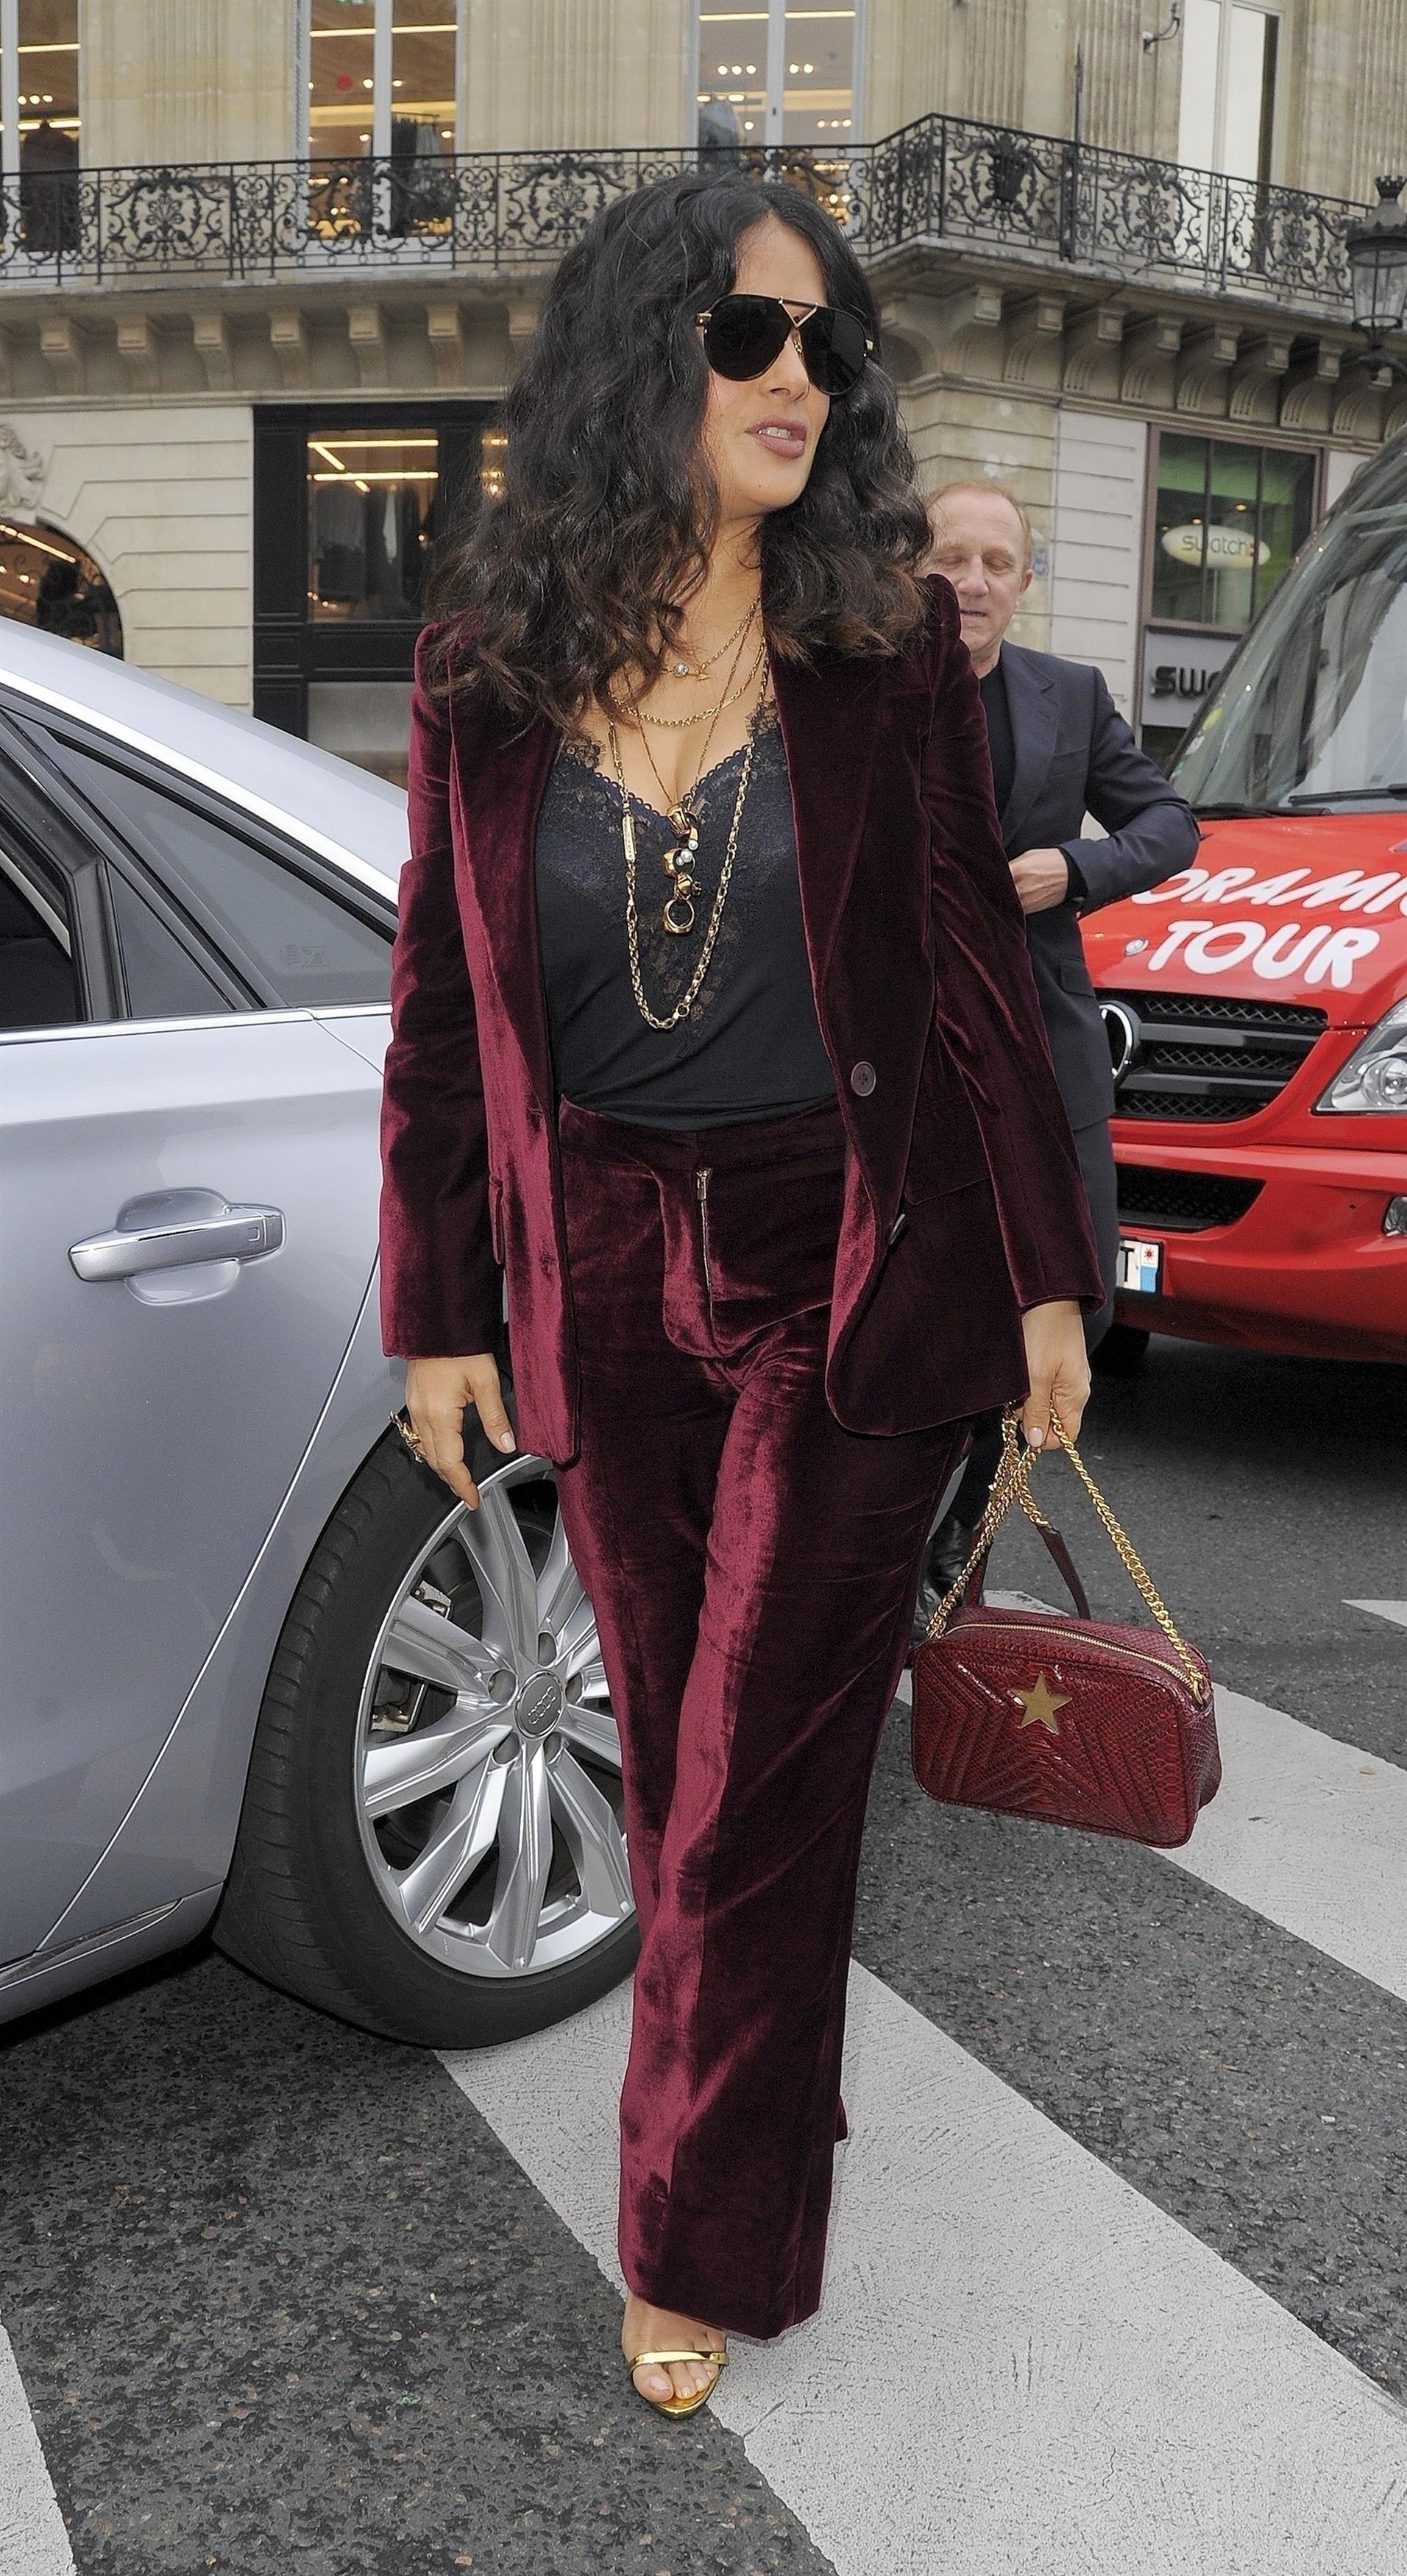 Paris, FRANCE  - Celebrities arrive at Paris Fashion Week 2017.  Pictured: Salma Hayek  BACKGRID UK 1 OCTOBER 2017, Image: 351405791, License: Rights-managed, Restrictions: , Model Release: no, Credit line: Profimedia, Xposurephotos